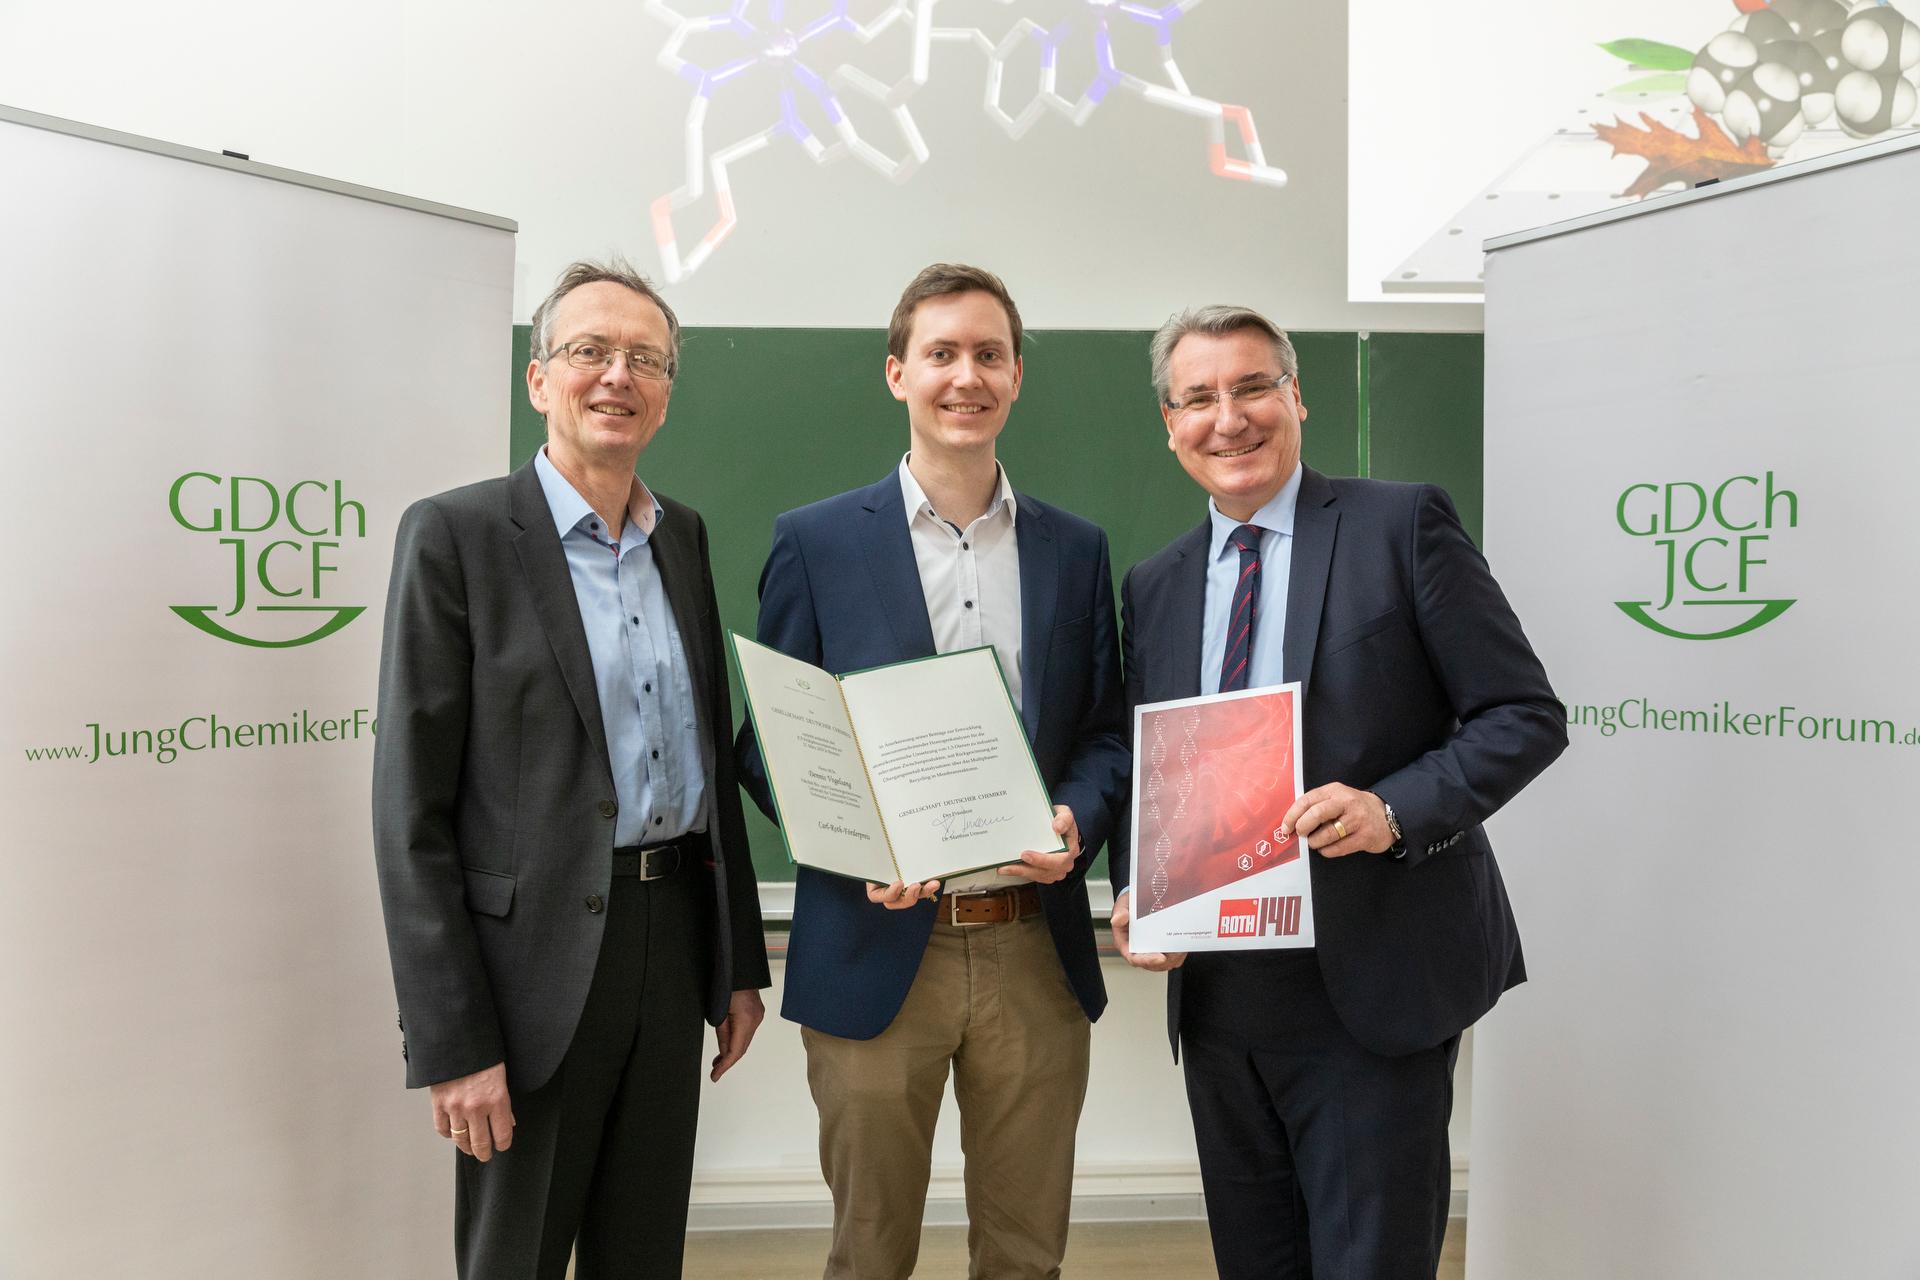 GDCh Preisverleihung Carl Roth Förderpreis